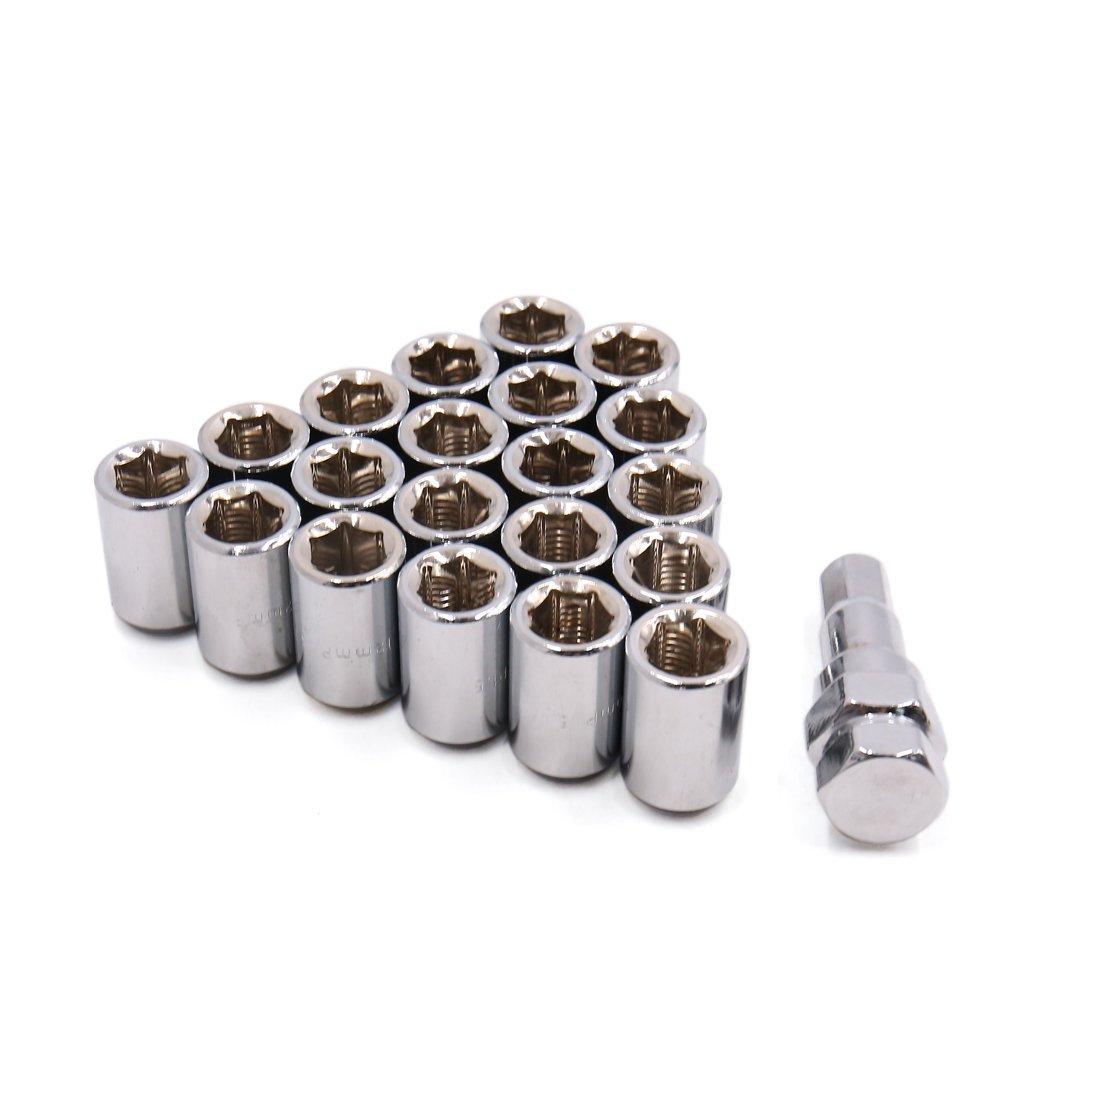 uxcell Silver Tone 12mm x 1.5 Closed End Extended Wheel Rim Steel Lug Nut Hex Key Set